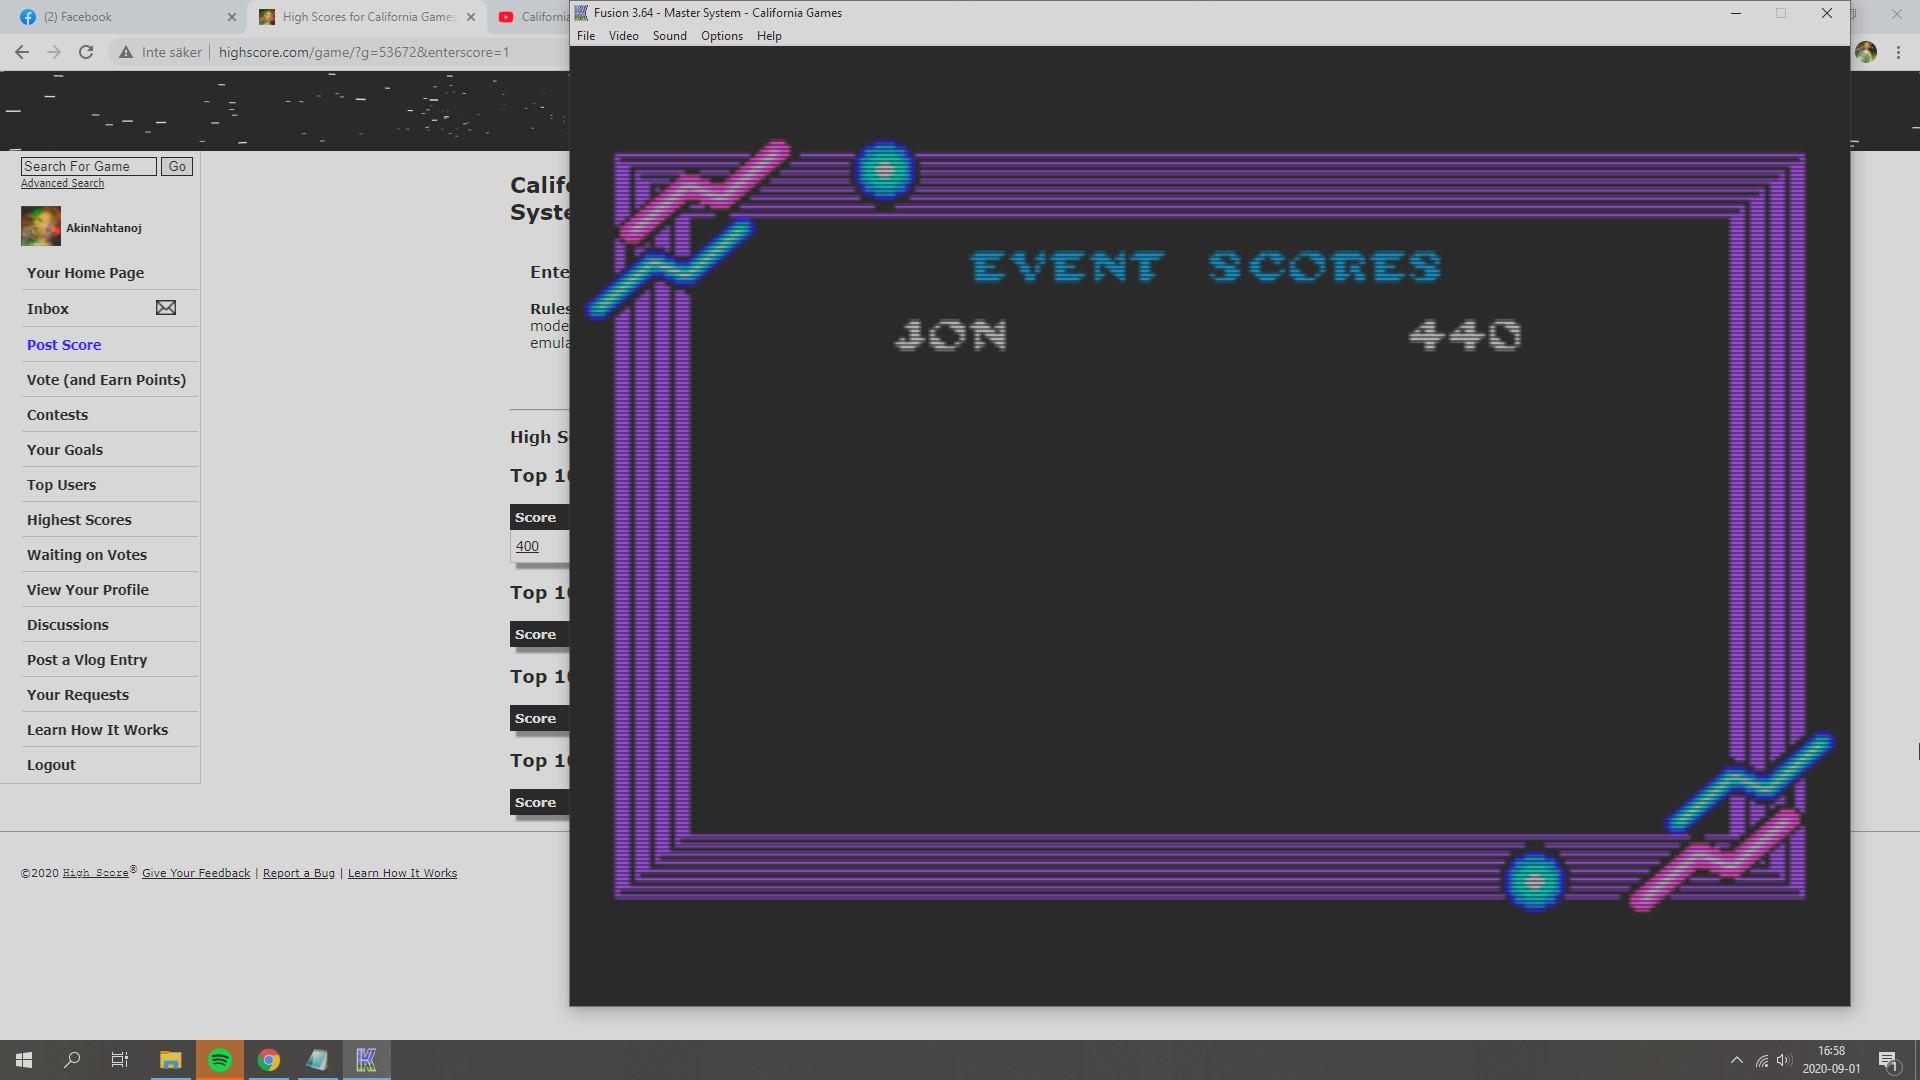 AkinNahtanoj: California Games: Flying Disk (Sega Master System Emulated) 440 points on 2020-09-01 10:02:34